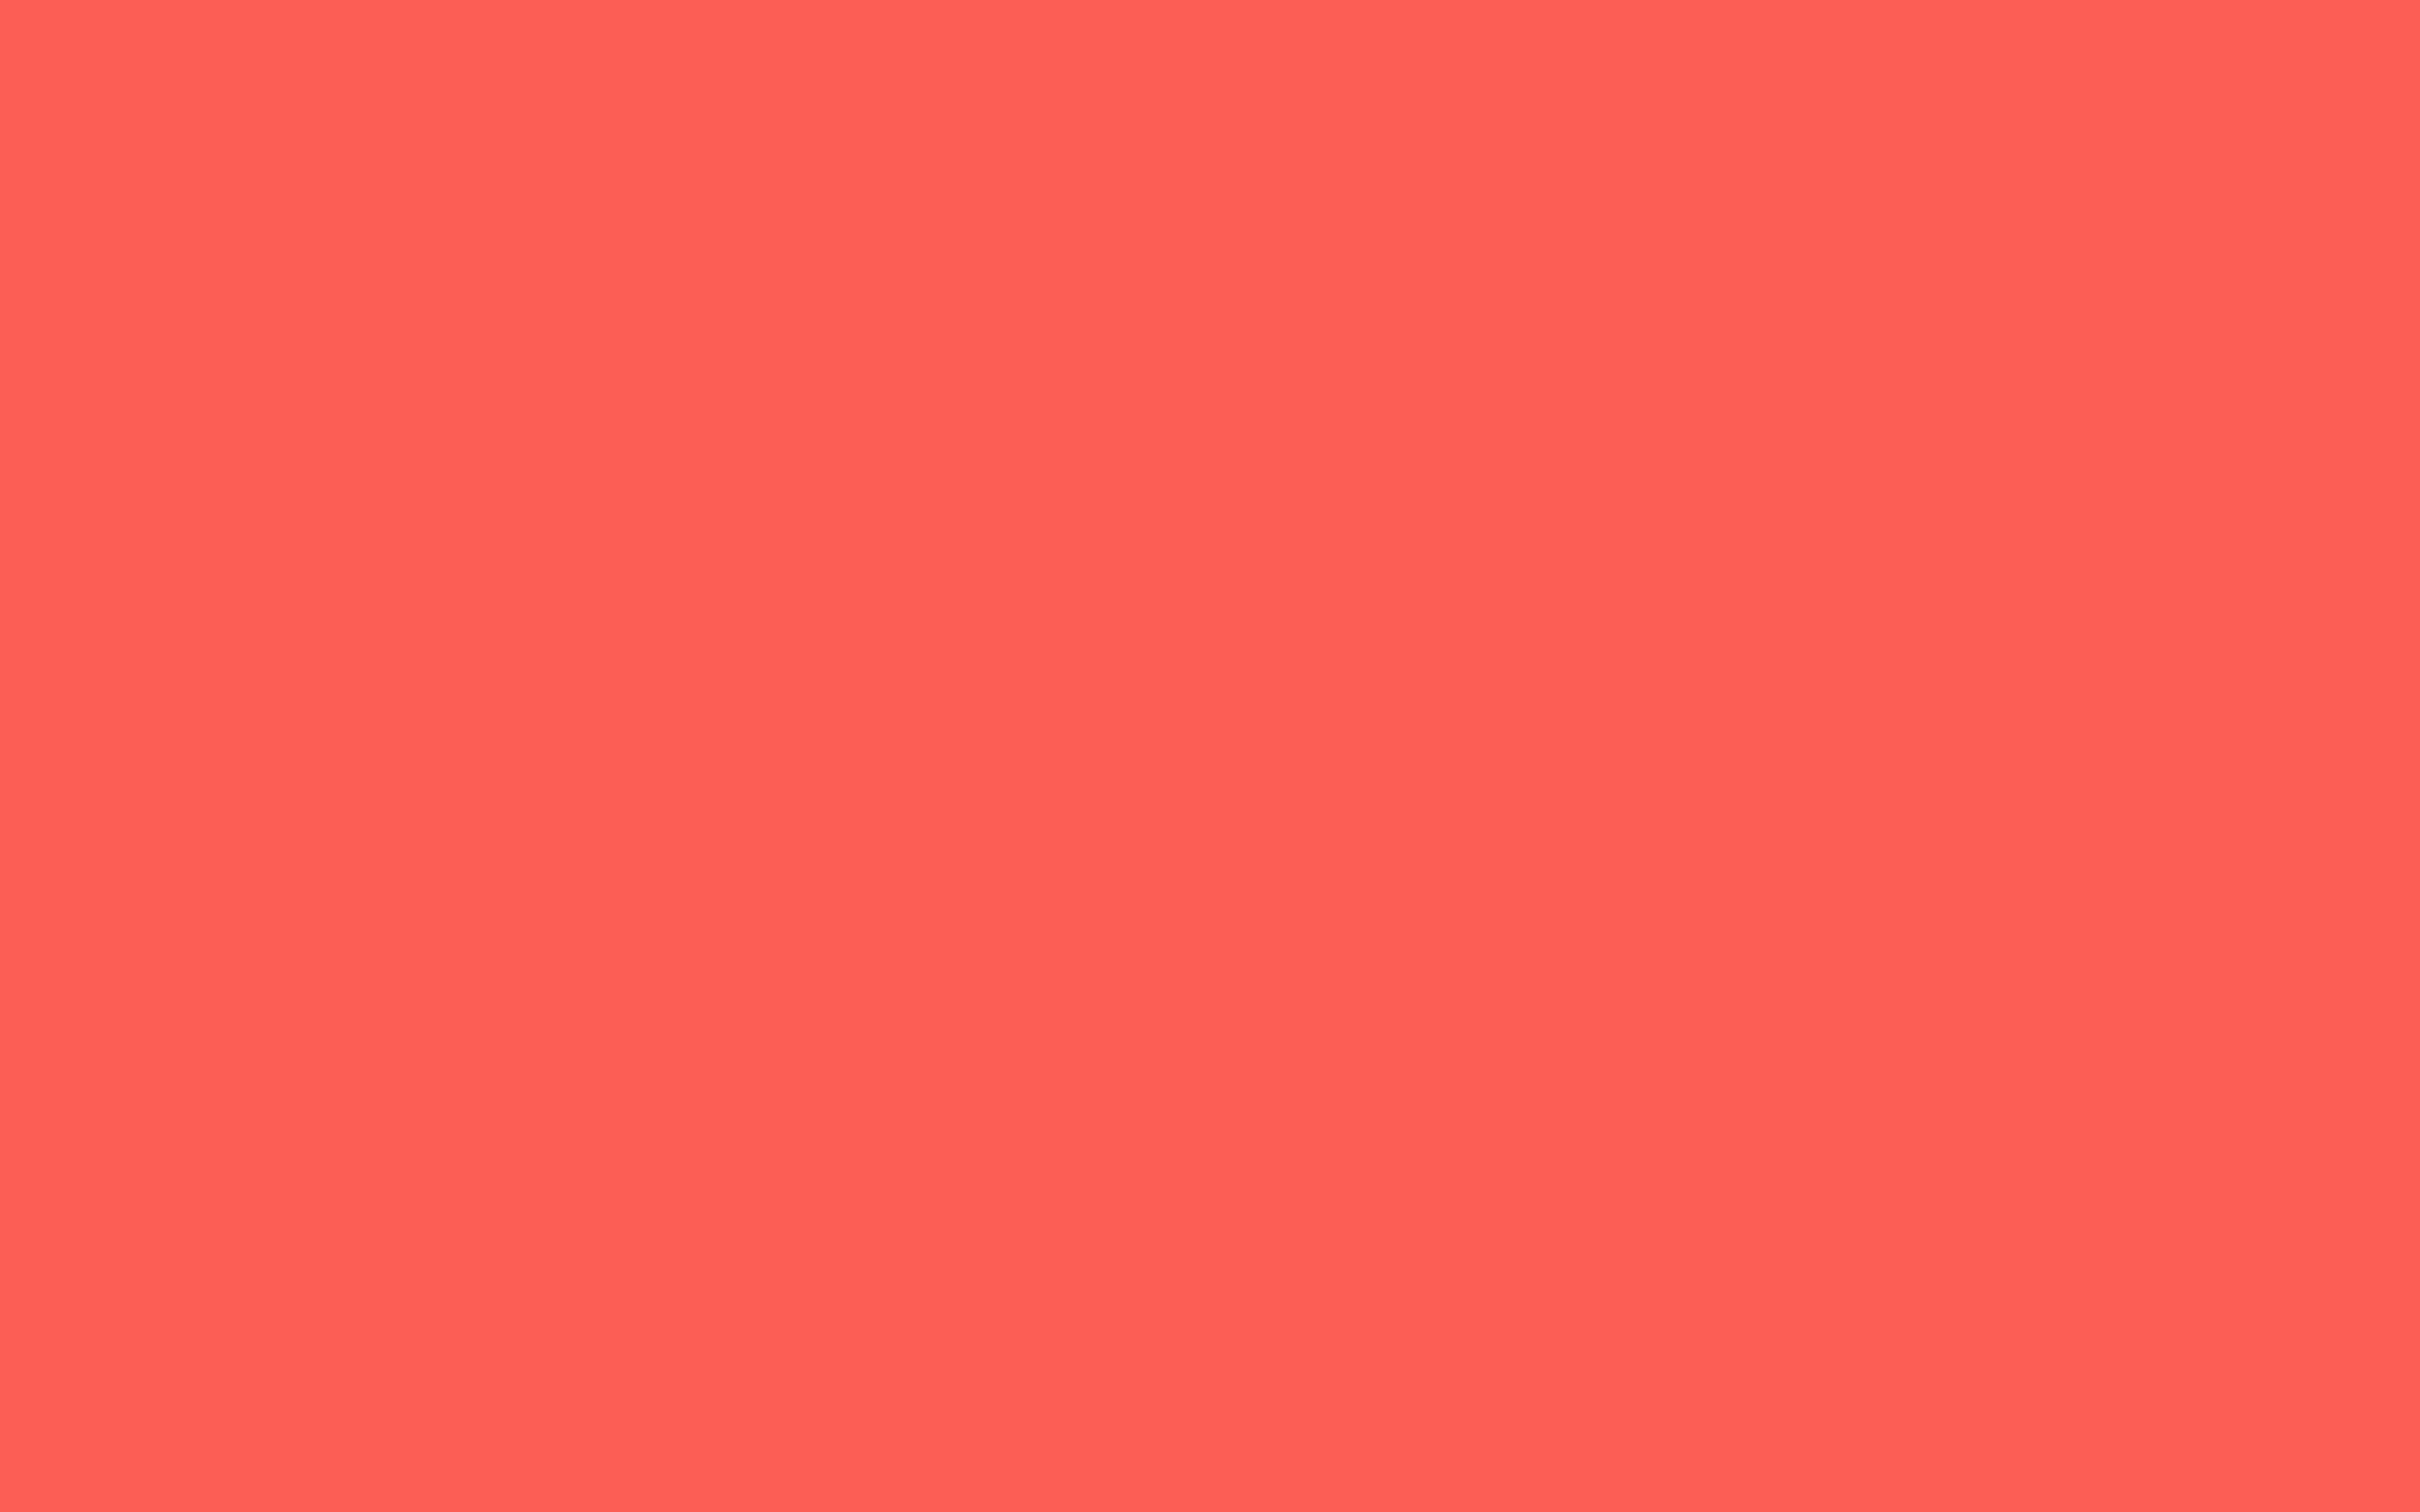 Unduh 990+ Background Images Orange Color HD Paling Keren